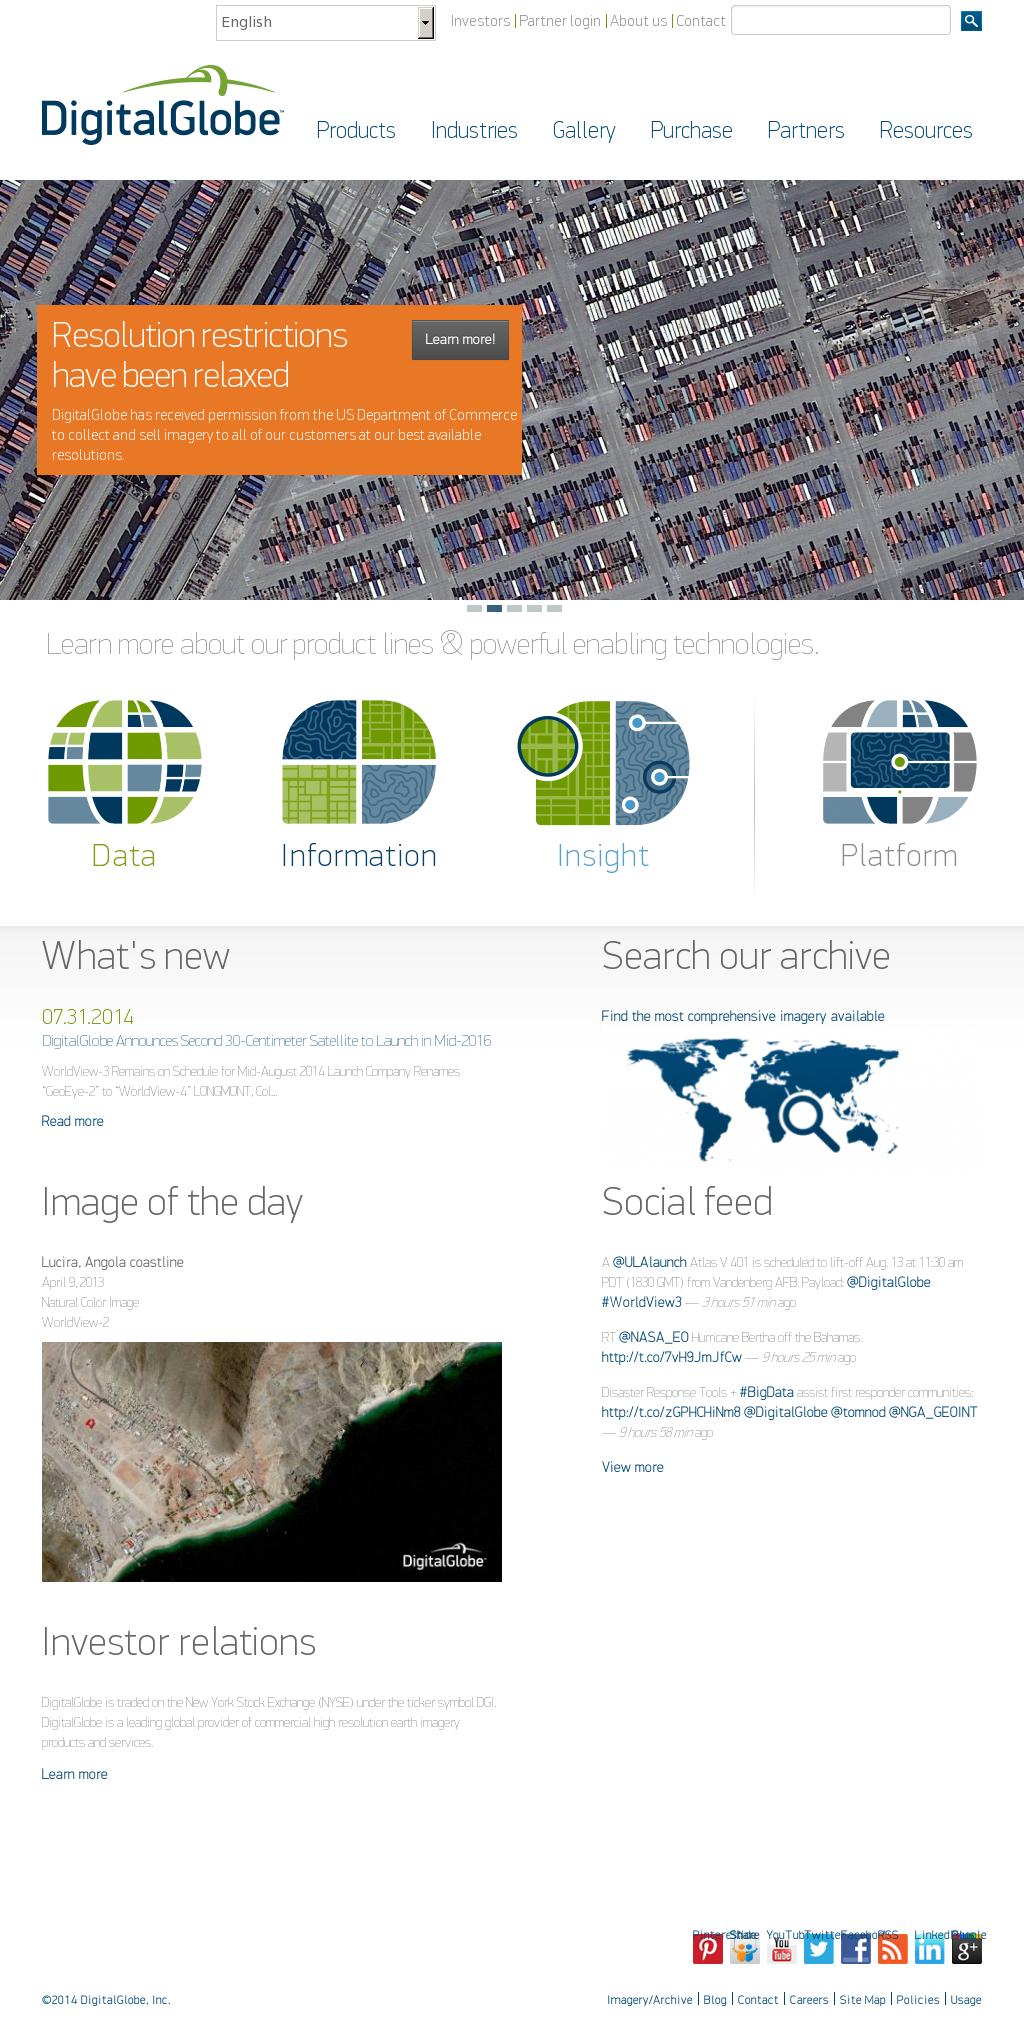 DigitalGlobe Competitors, Revenue and Employees - Owler Company Profile